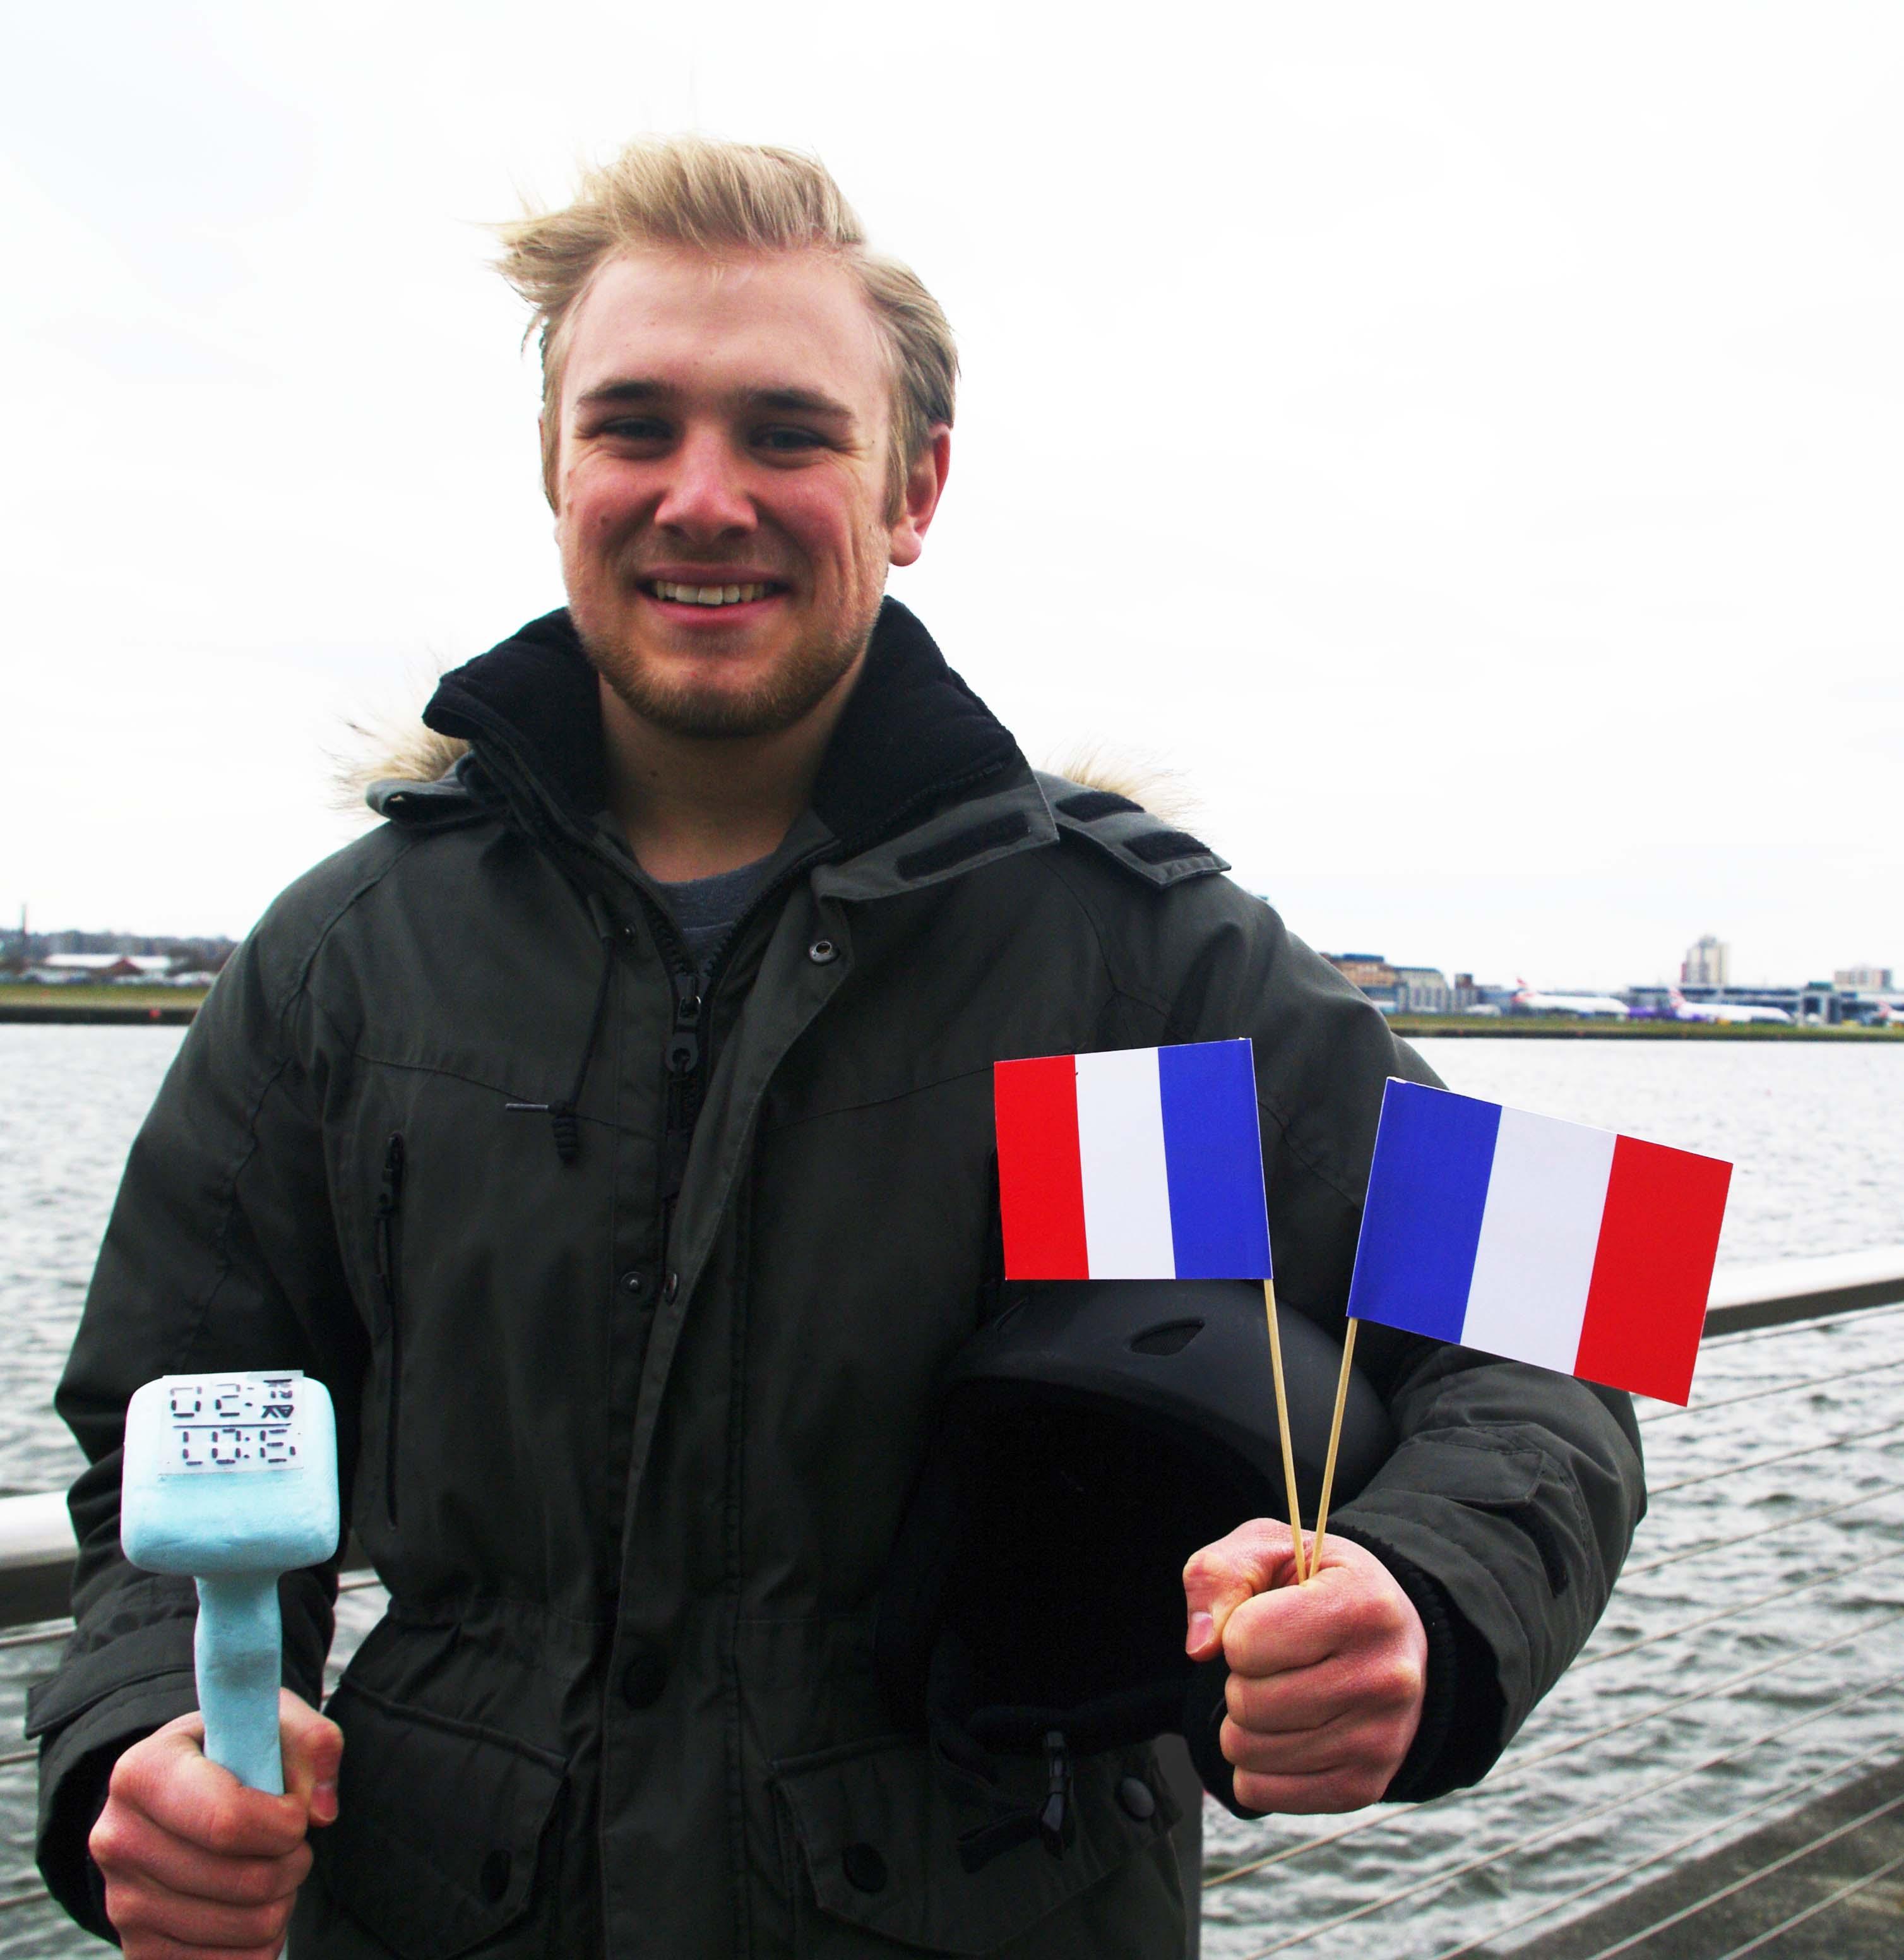 Ski inventor Charlie